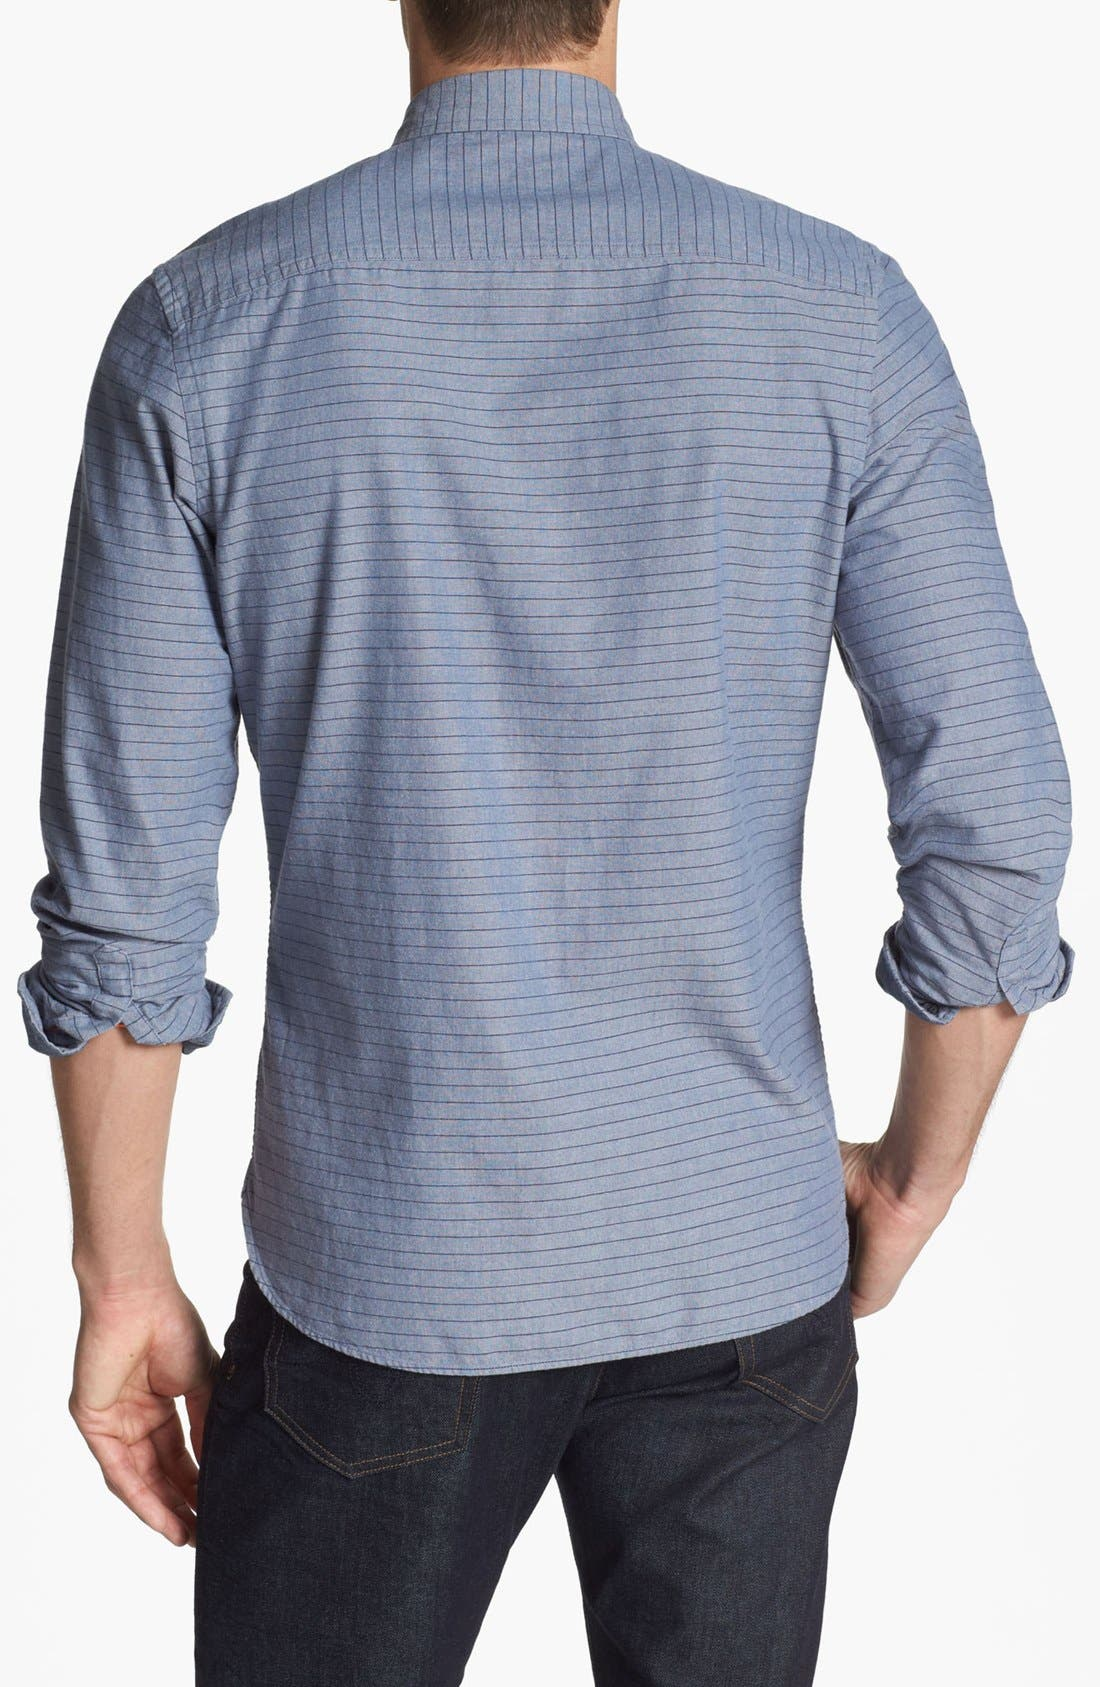 Alternate Image 2  - Wallin & Bros. Trim Fit Sport Shirt